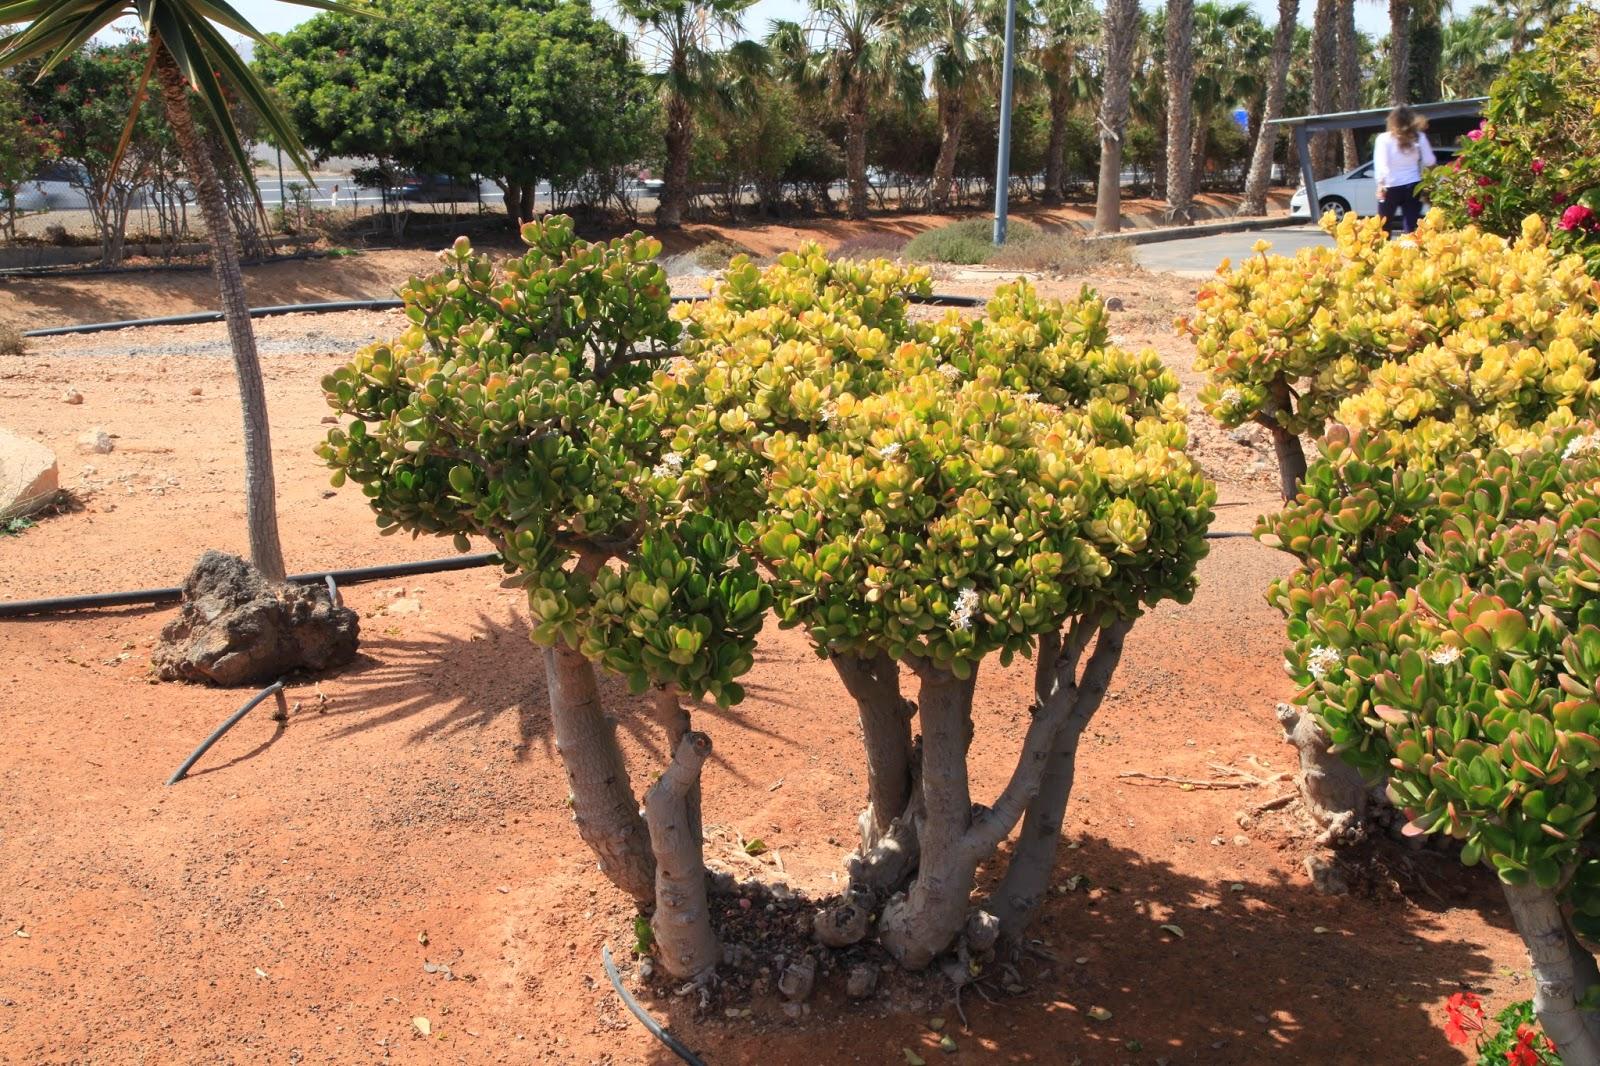 Crassula suculenta planta de jade sementes bonsai p mudas r 9 99 em mercado livre - Jm puerto del rosario ...